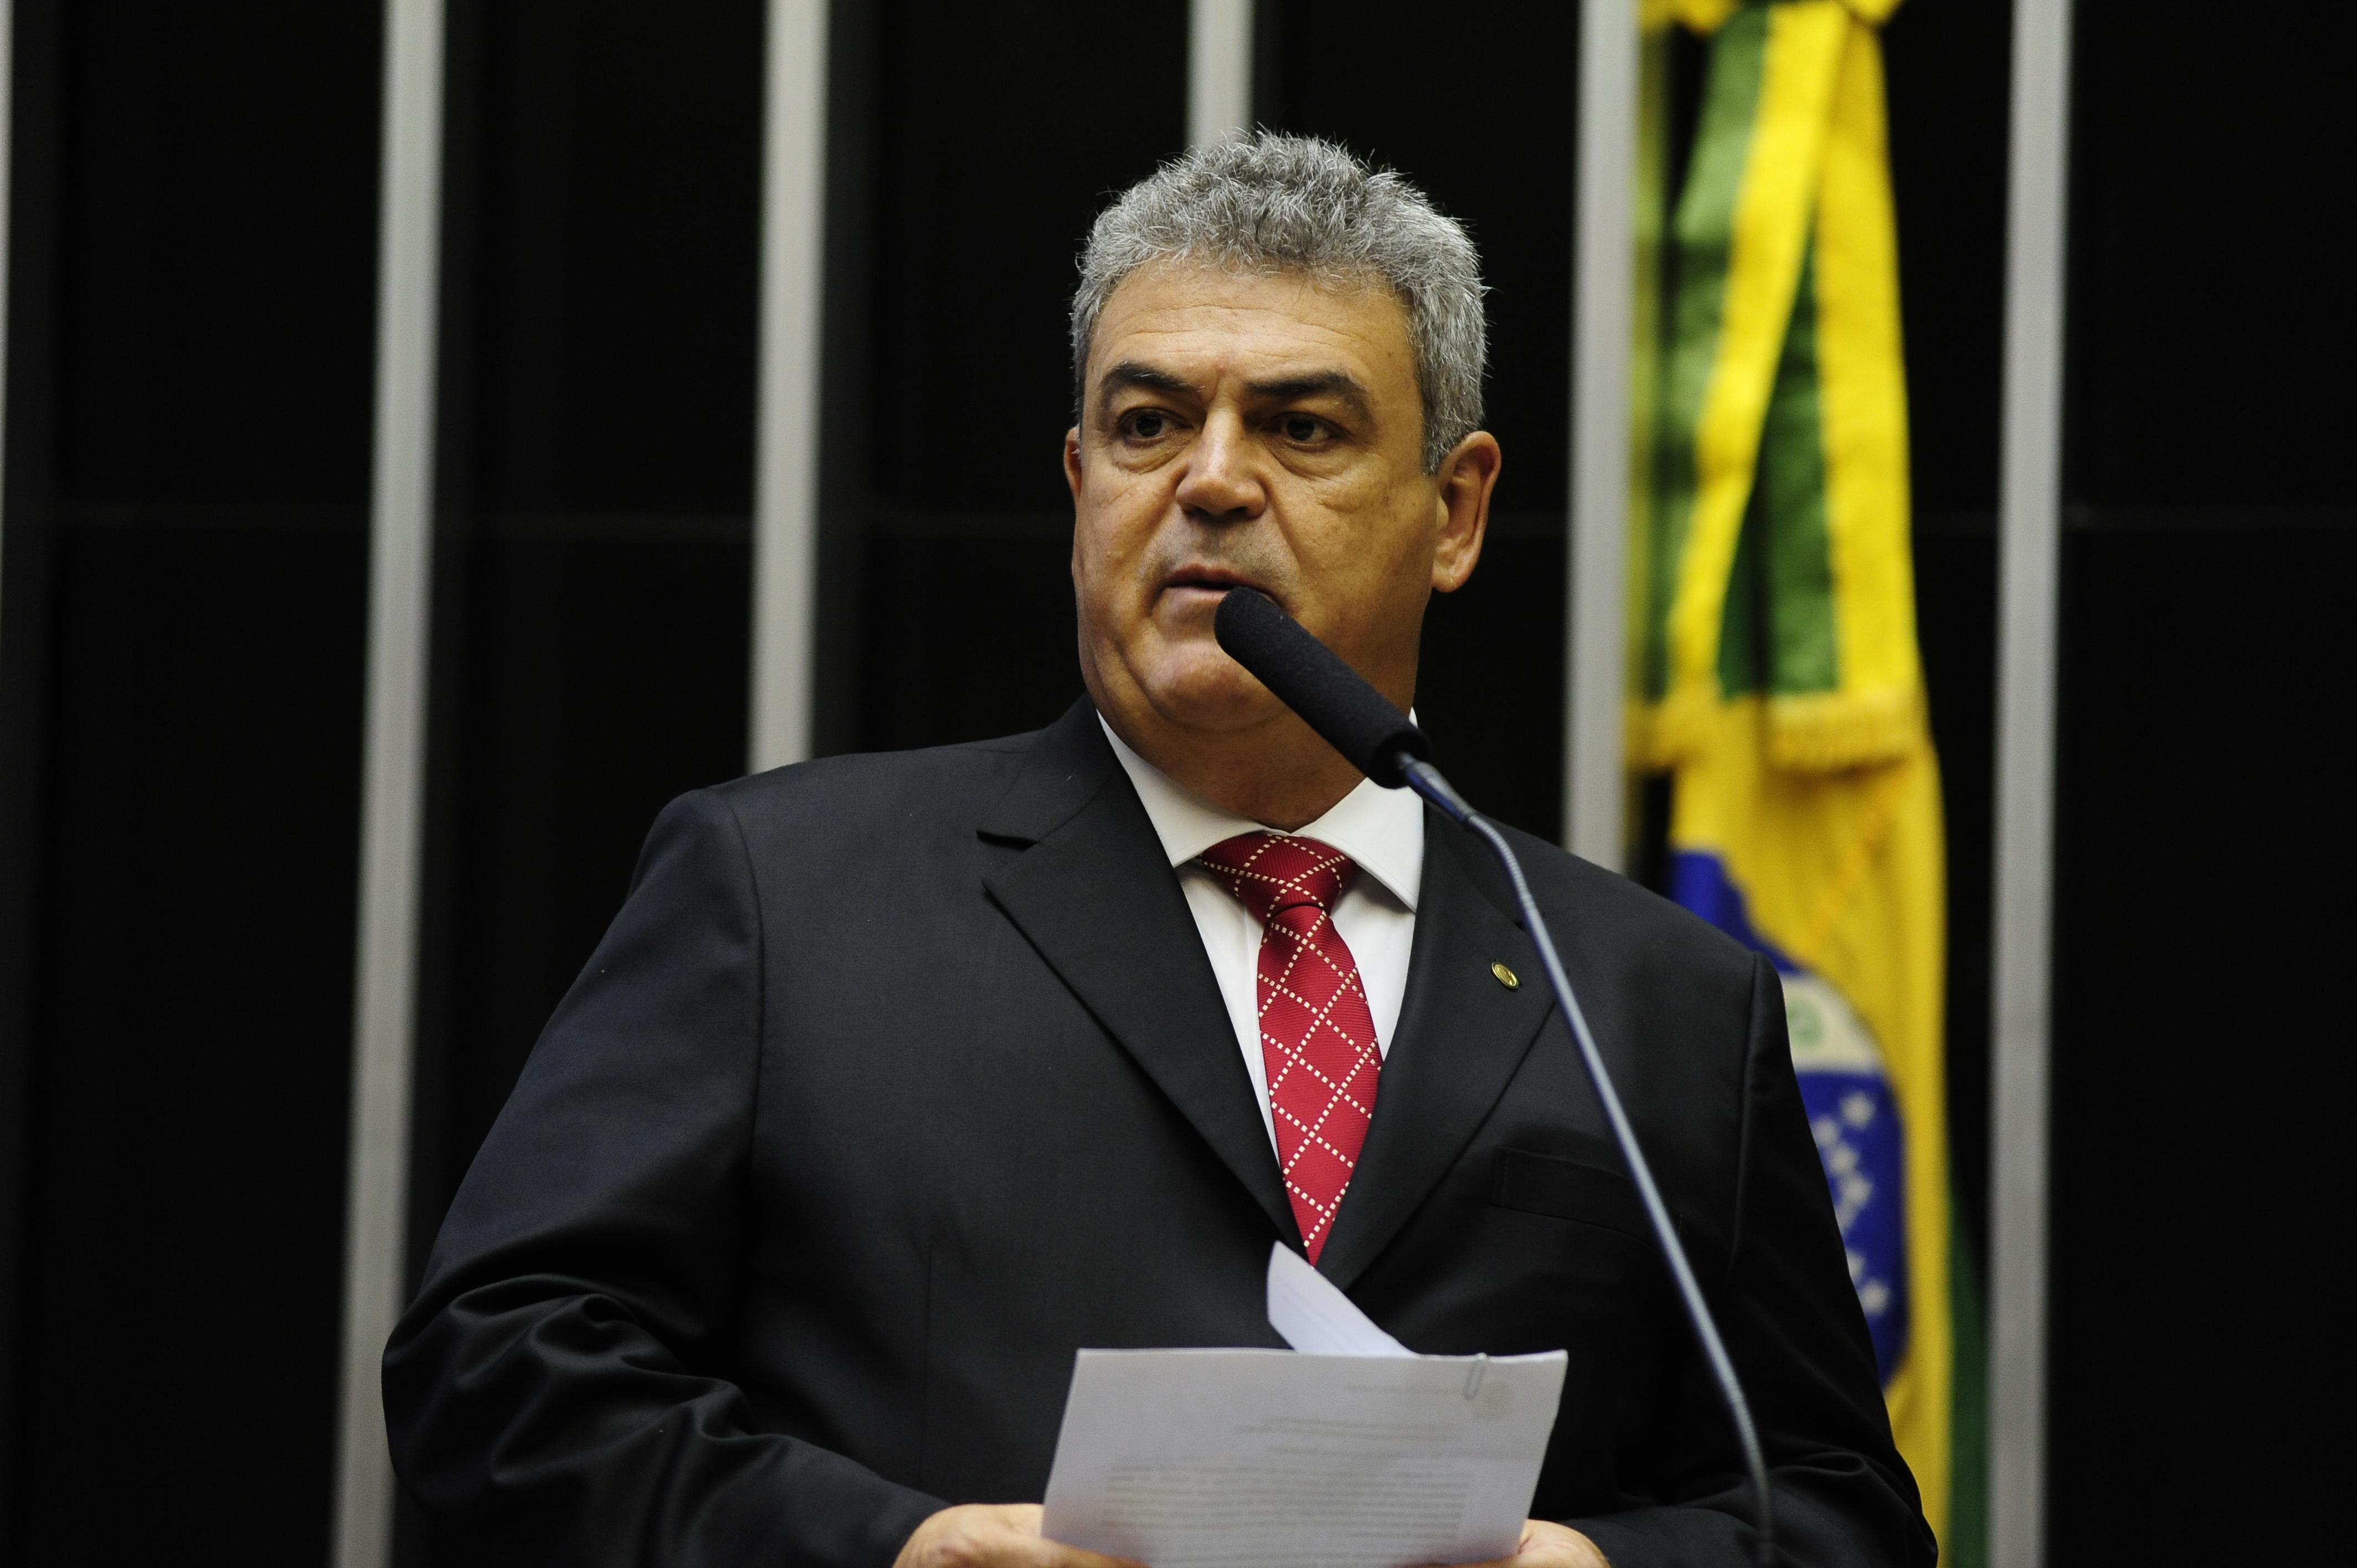 deputado Misael Varella